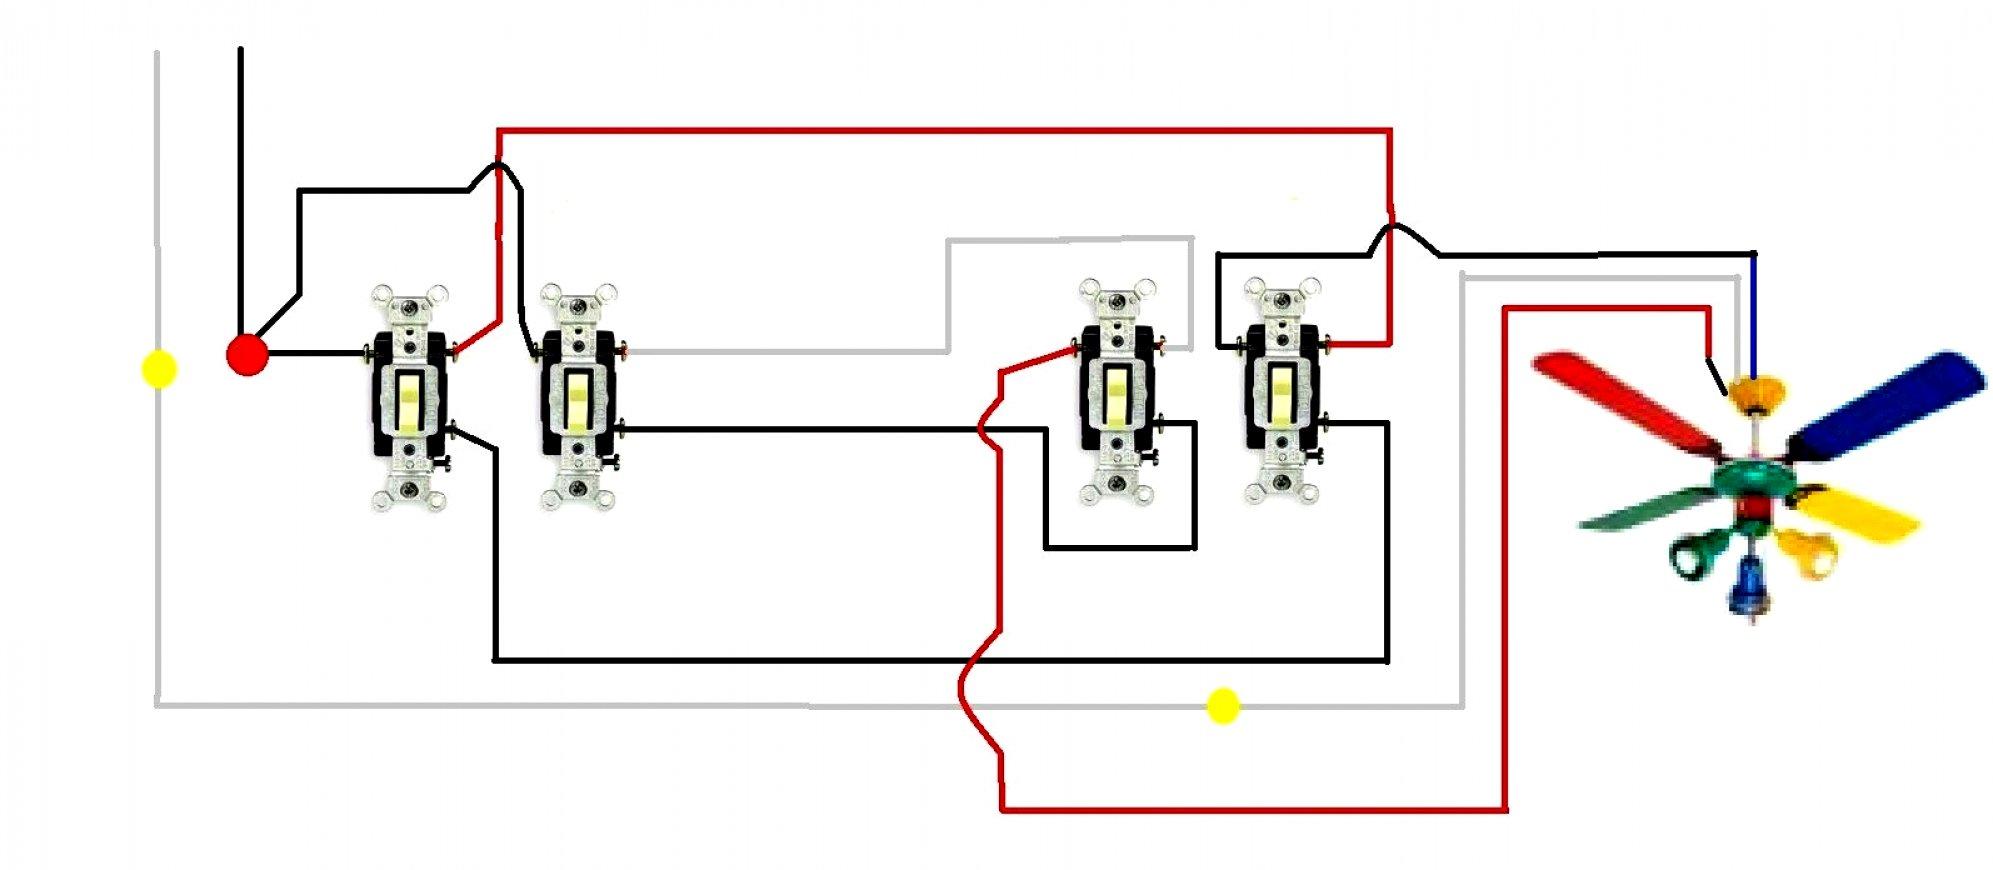 Diagram Wiring Diagram Hunter Ceiling Fan 25510 Full Version Hd Quality Fan 25510 Schematicfile Blidetoine Fr